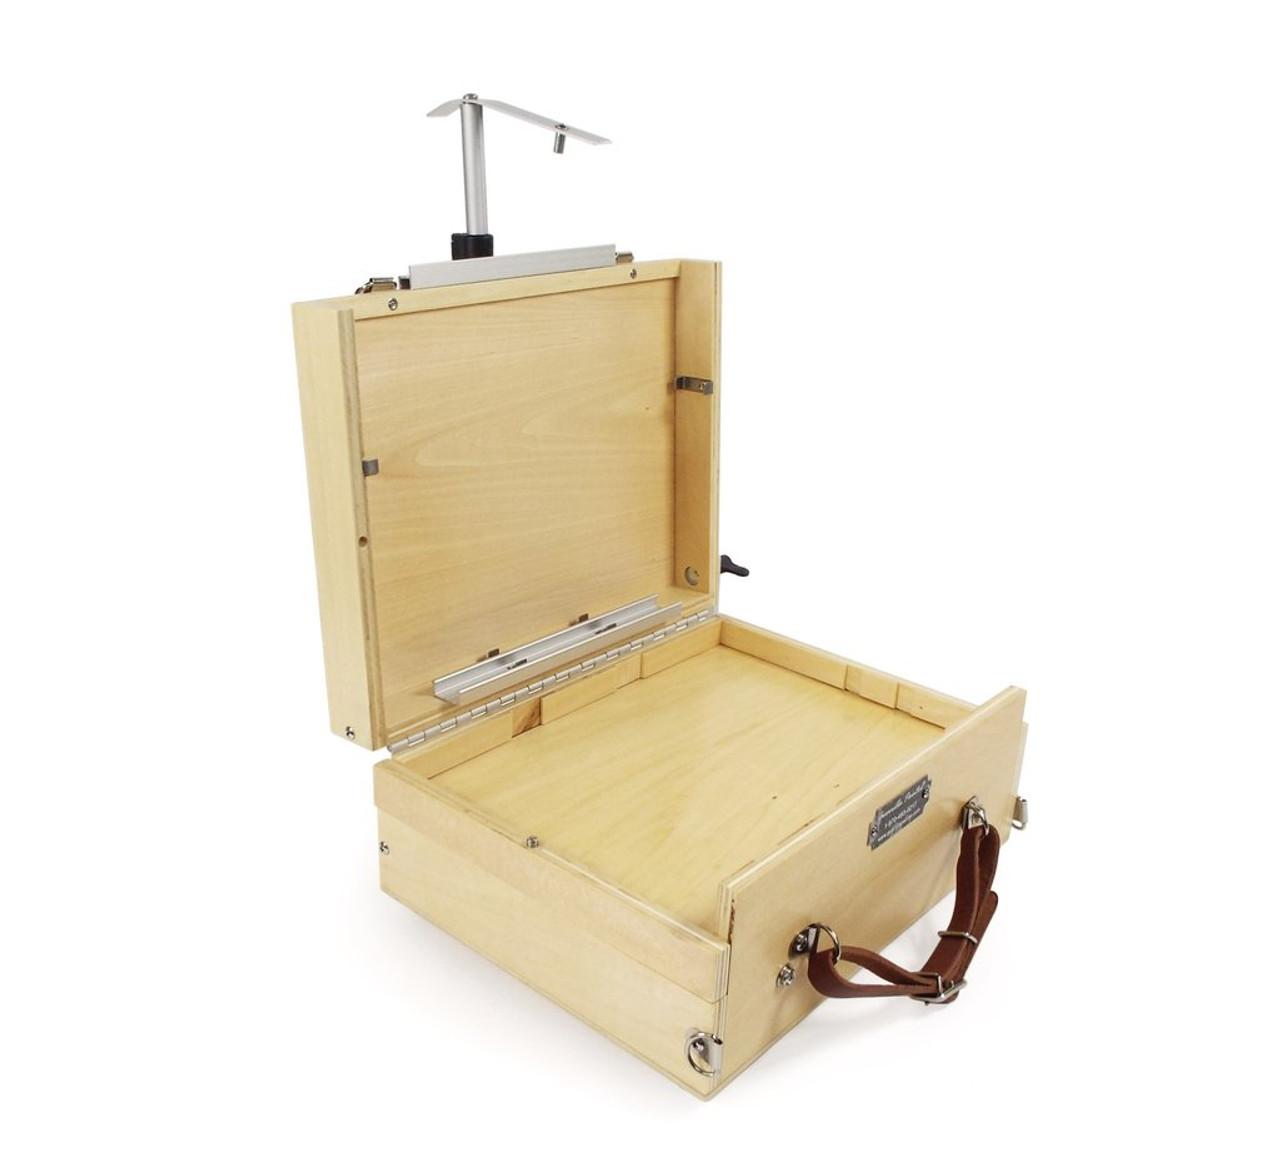 Guerilla Box (not included) Telescoping Easel 9x12